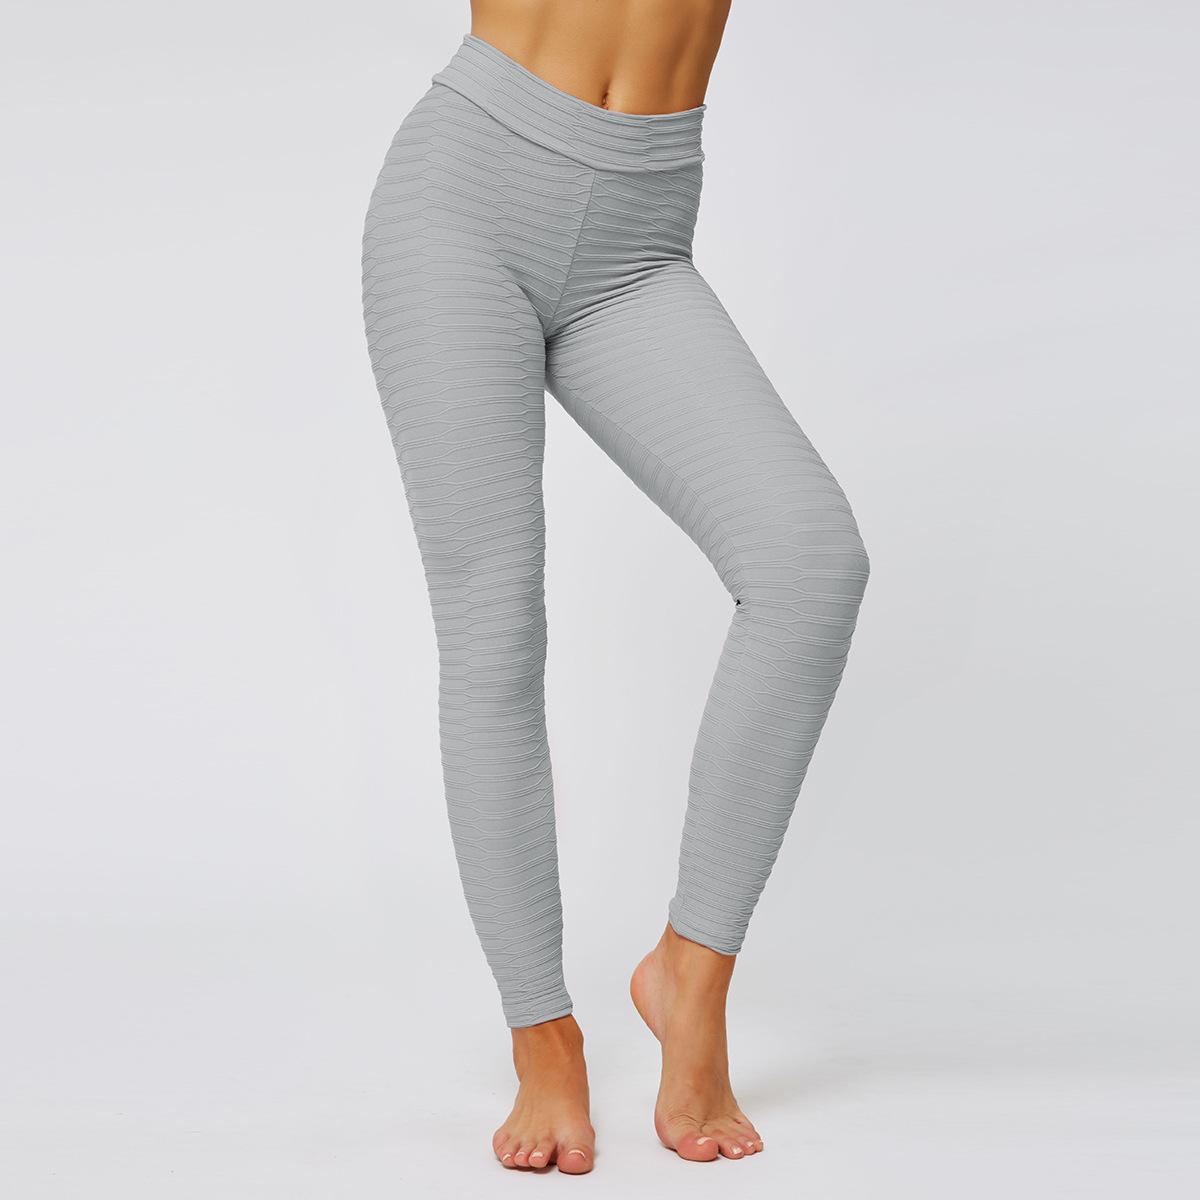 sexy tight three-dimensional hip yoga pants NSLX9032